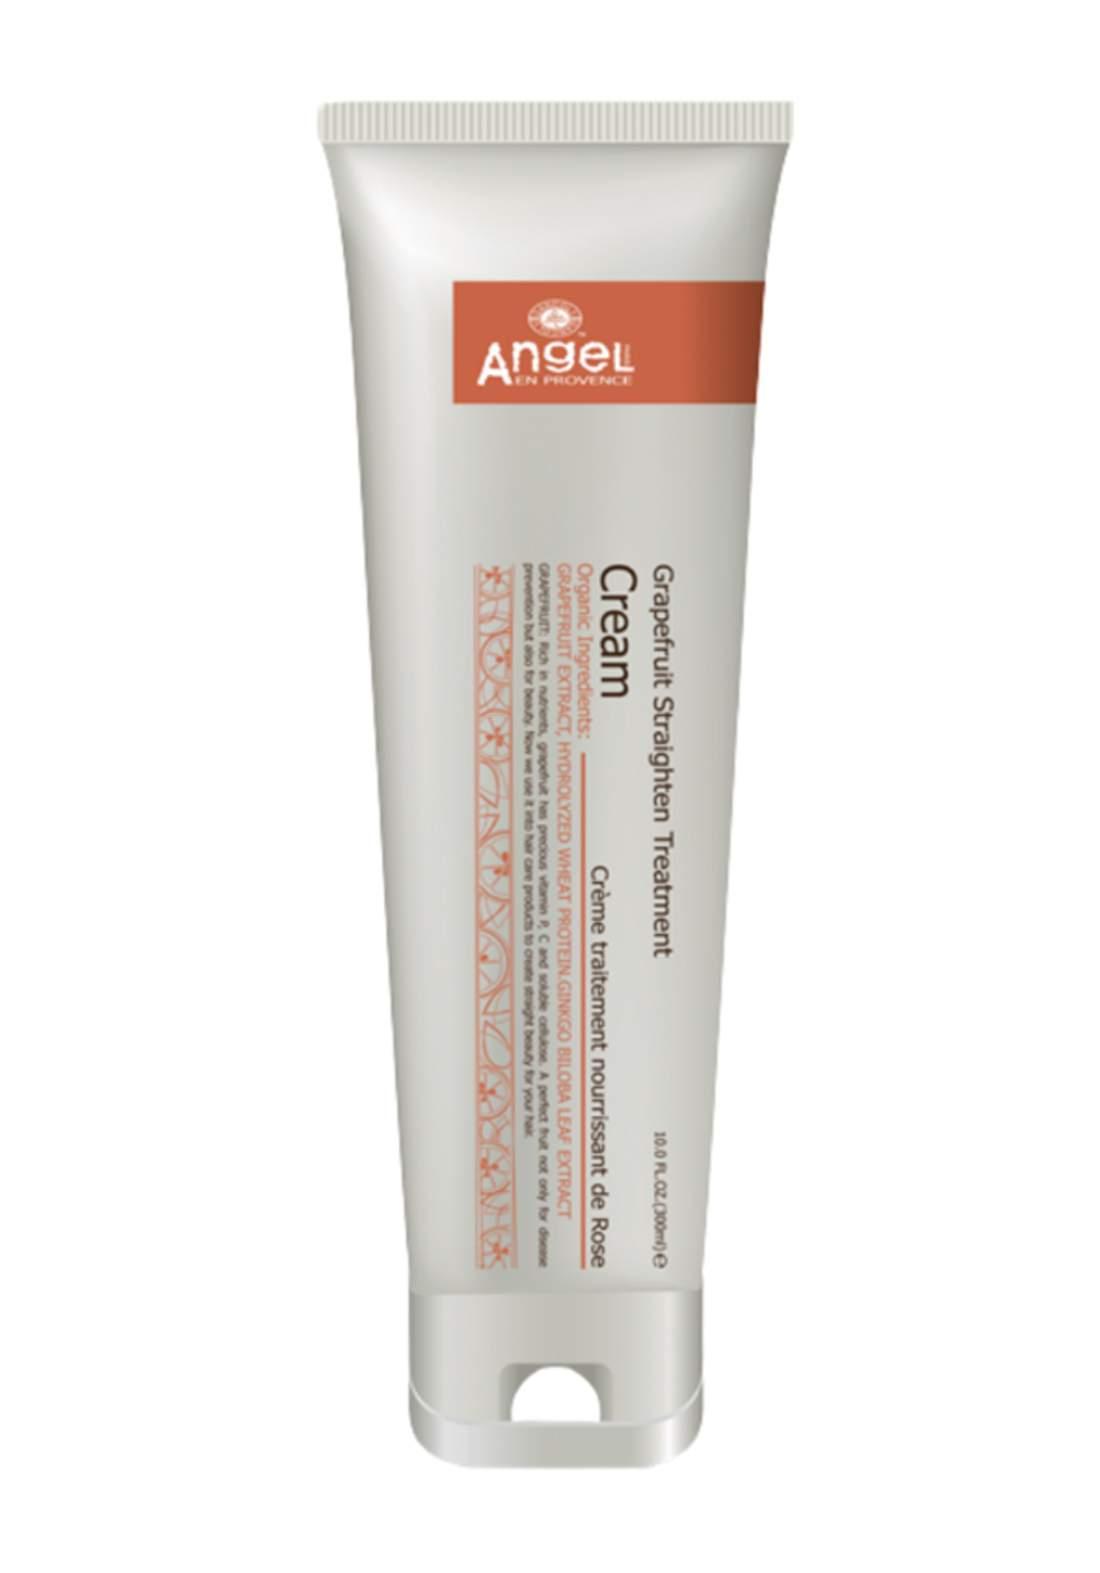 Angel En Provence Grapefruit Straighten Treatment Cream 300ml كريم